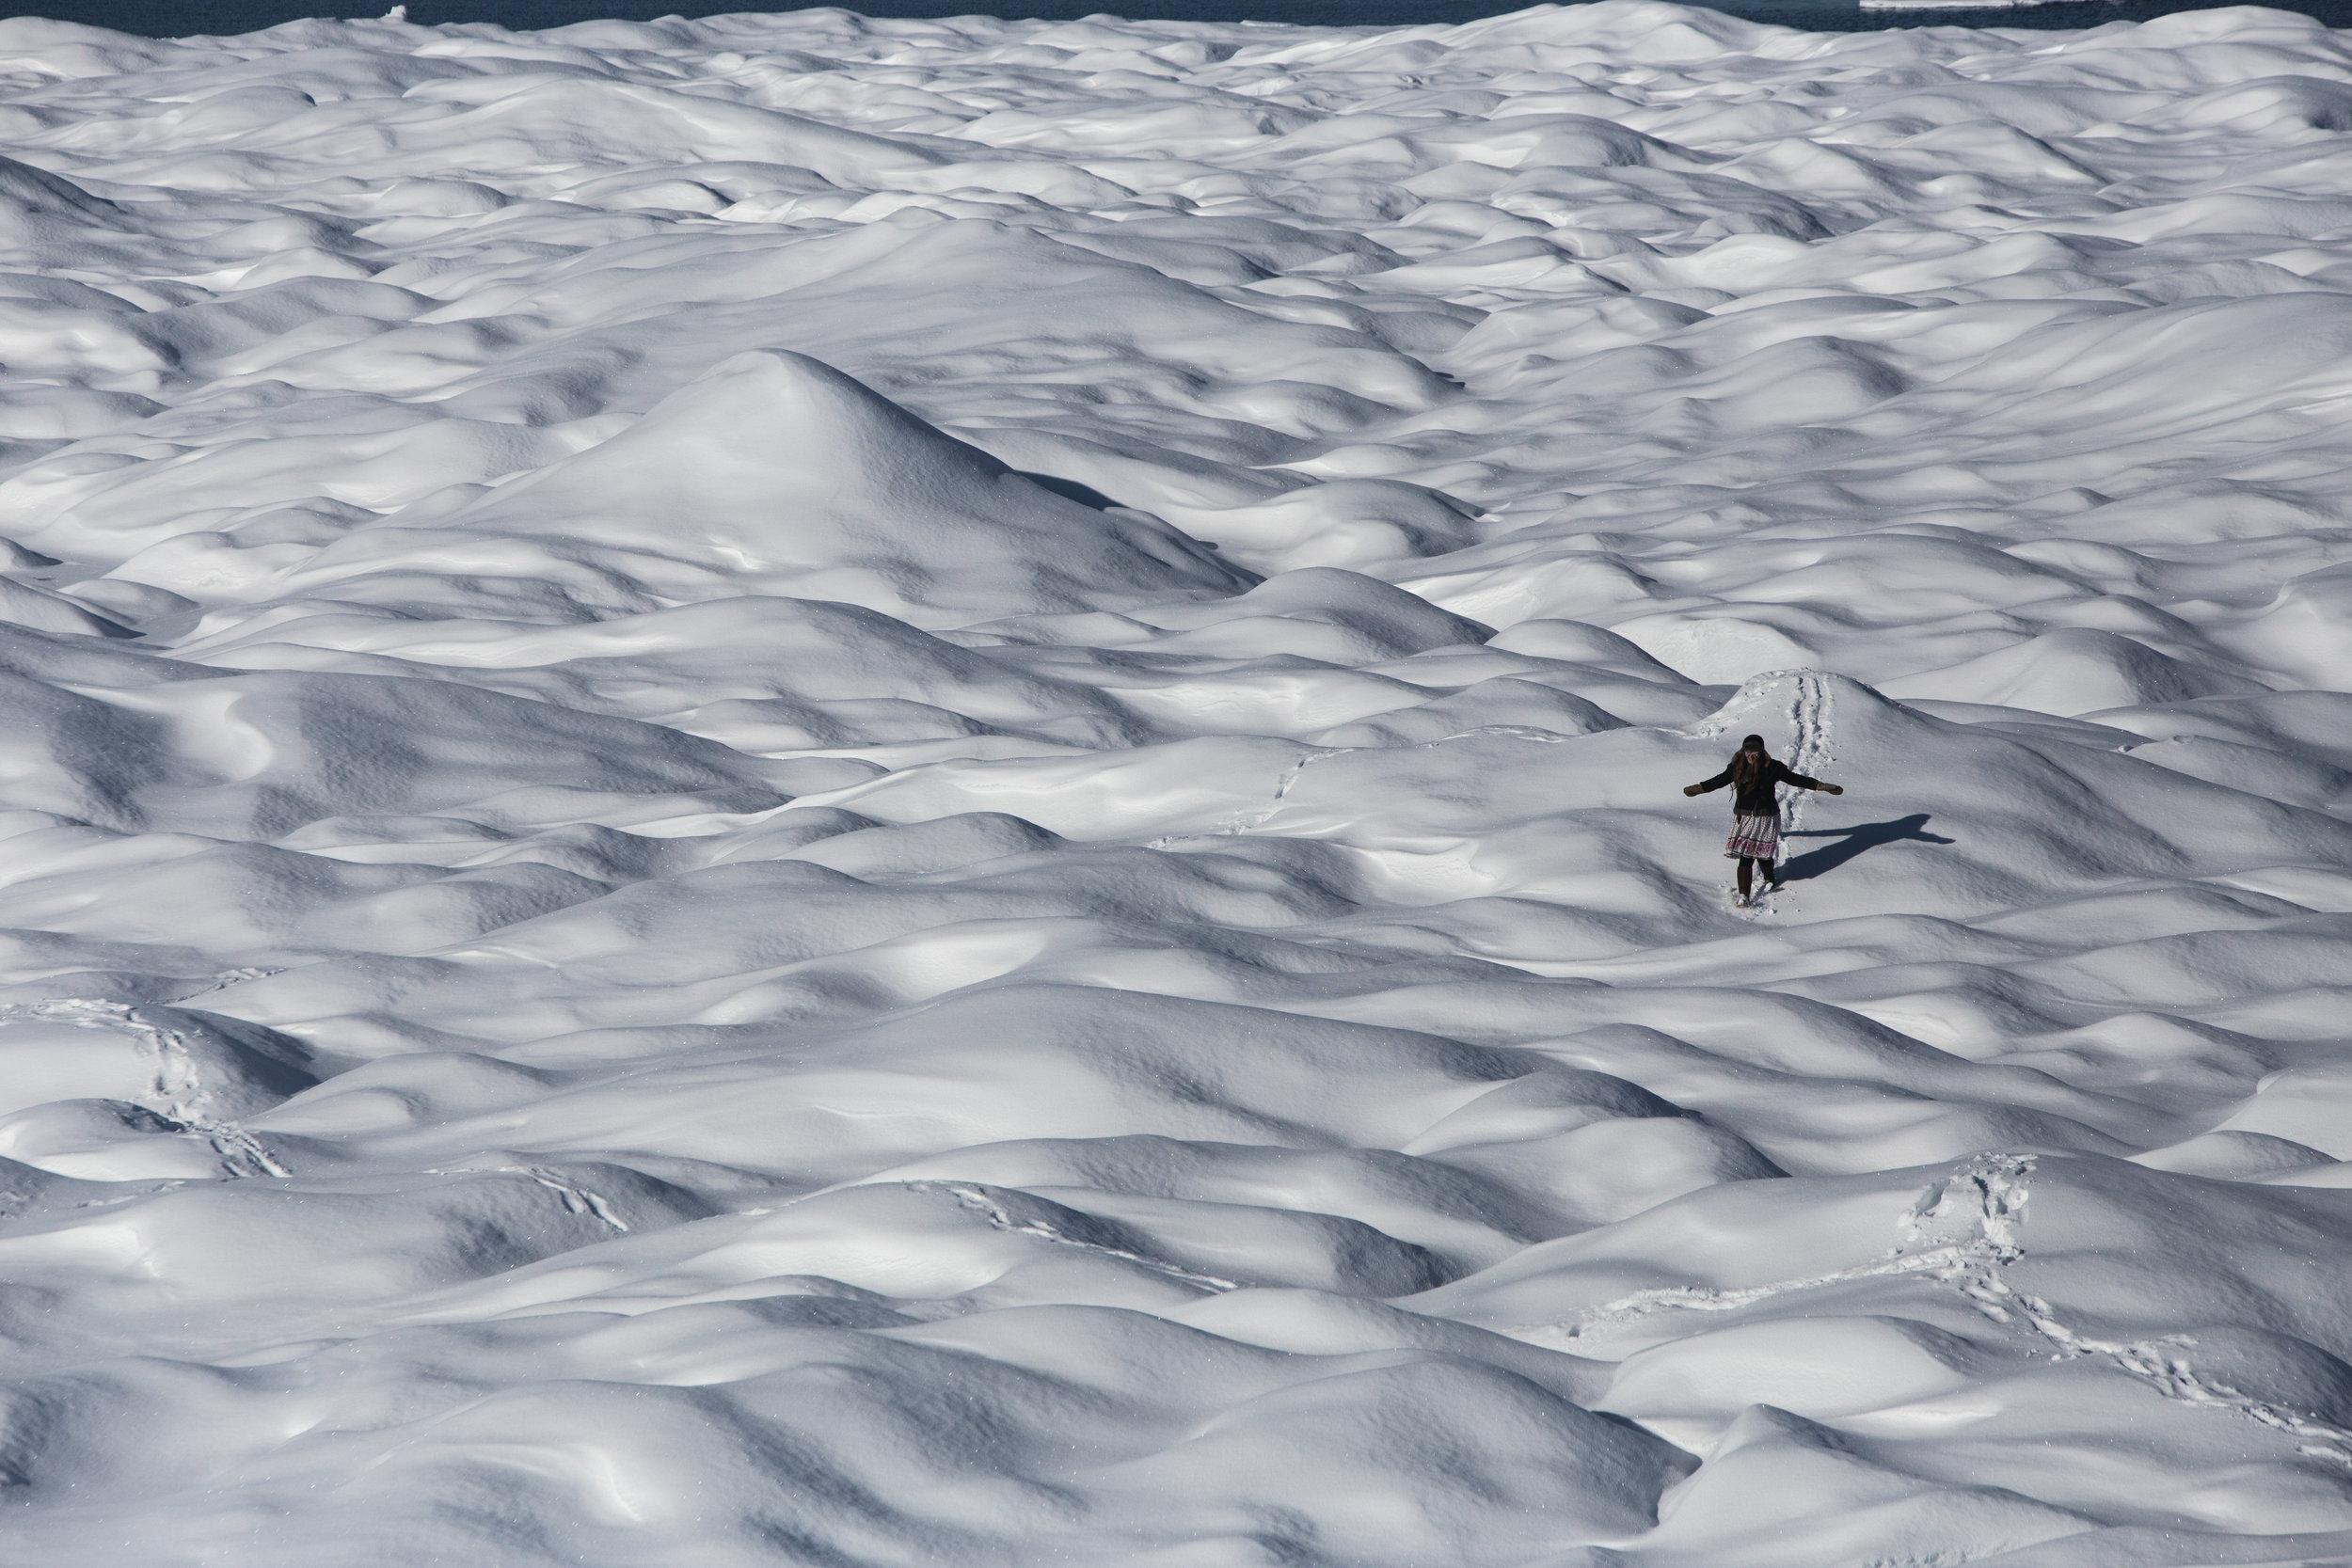 Victoria Strait, Canada